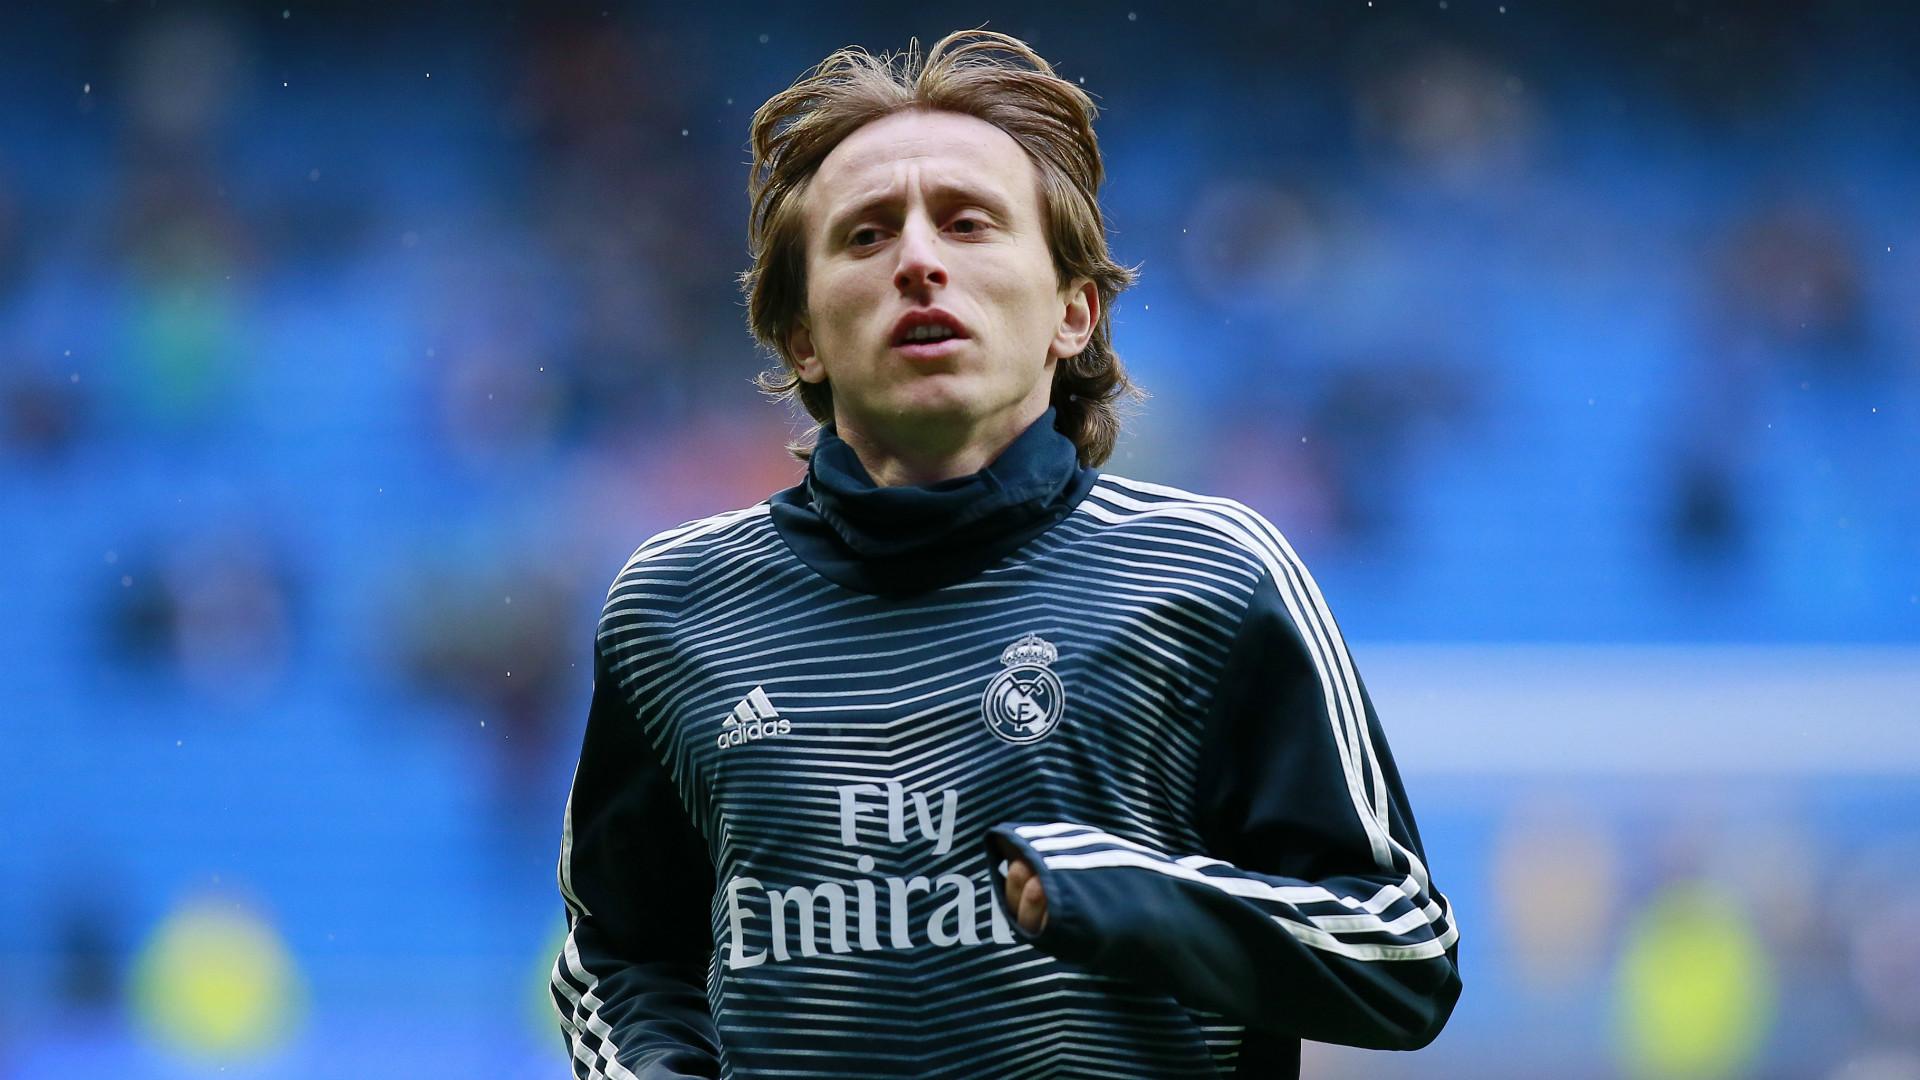 Mercato - Real Madrid : Luka Modric dans le viseur de l'AC Milan ?